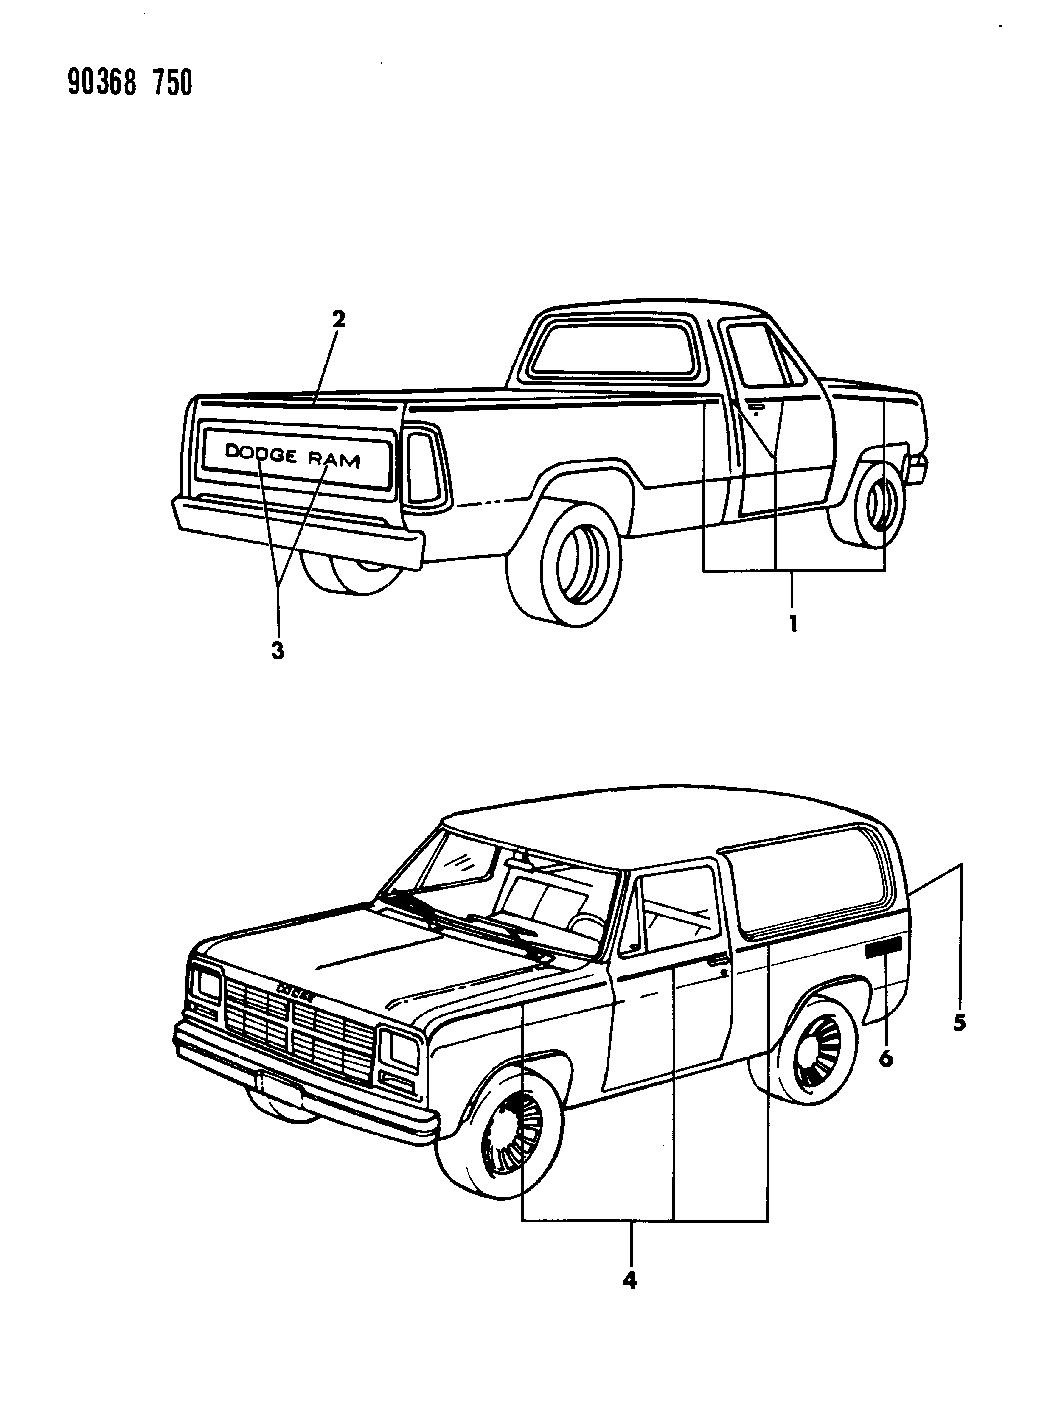 1992 Dodge Ramcharger Tape Stripes & Decals - Mopar Parts Giant